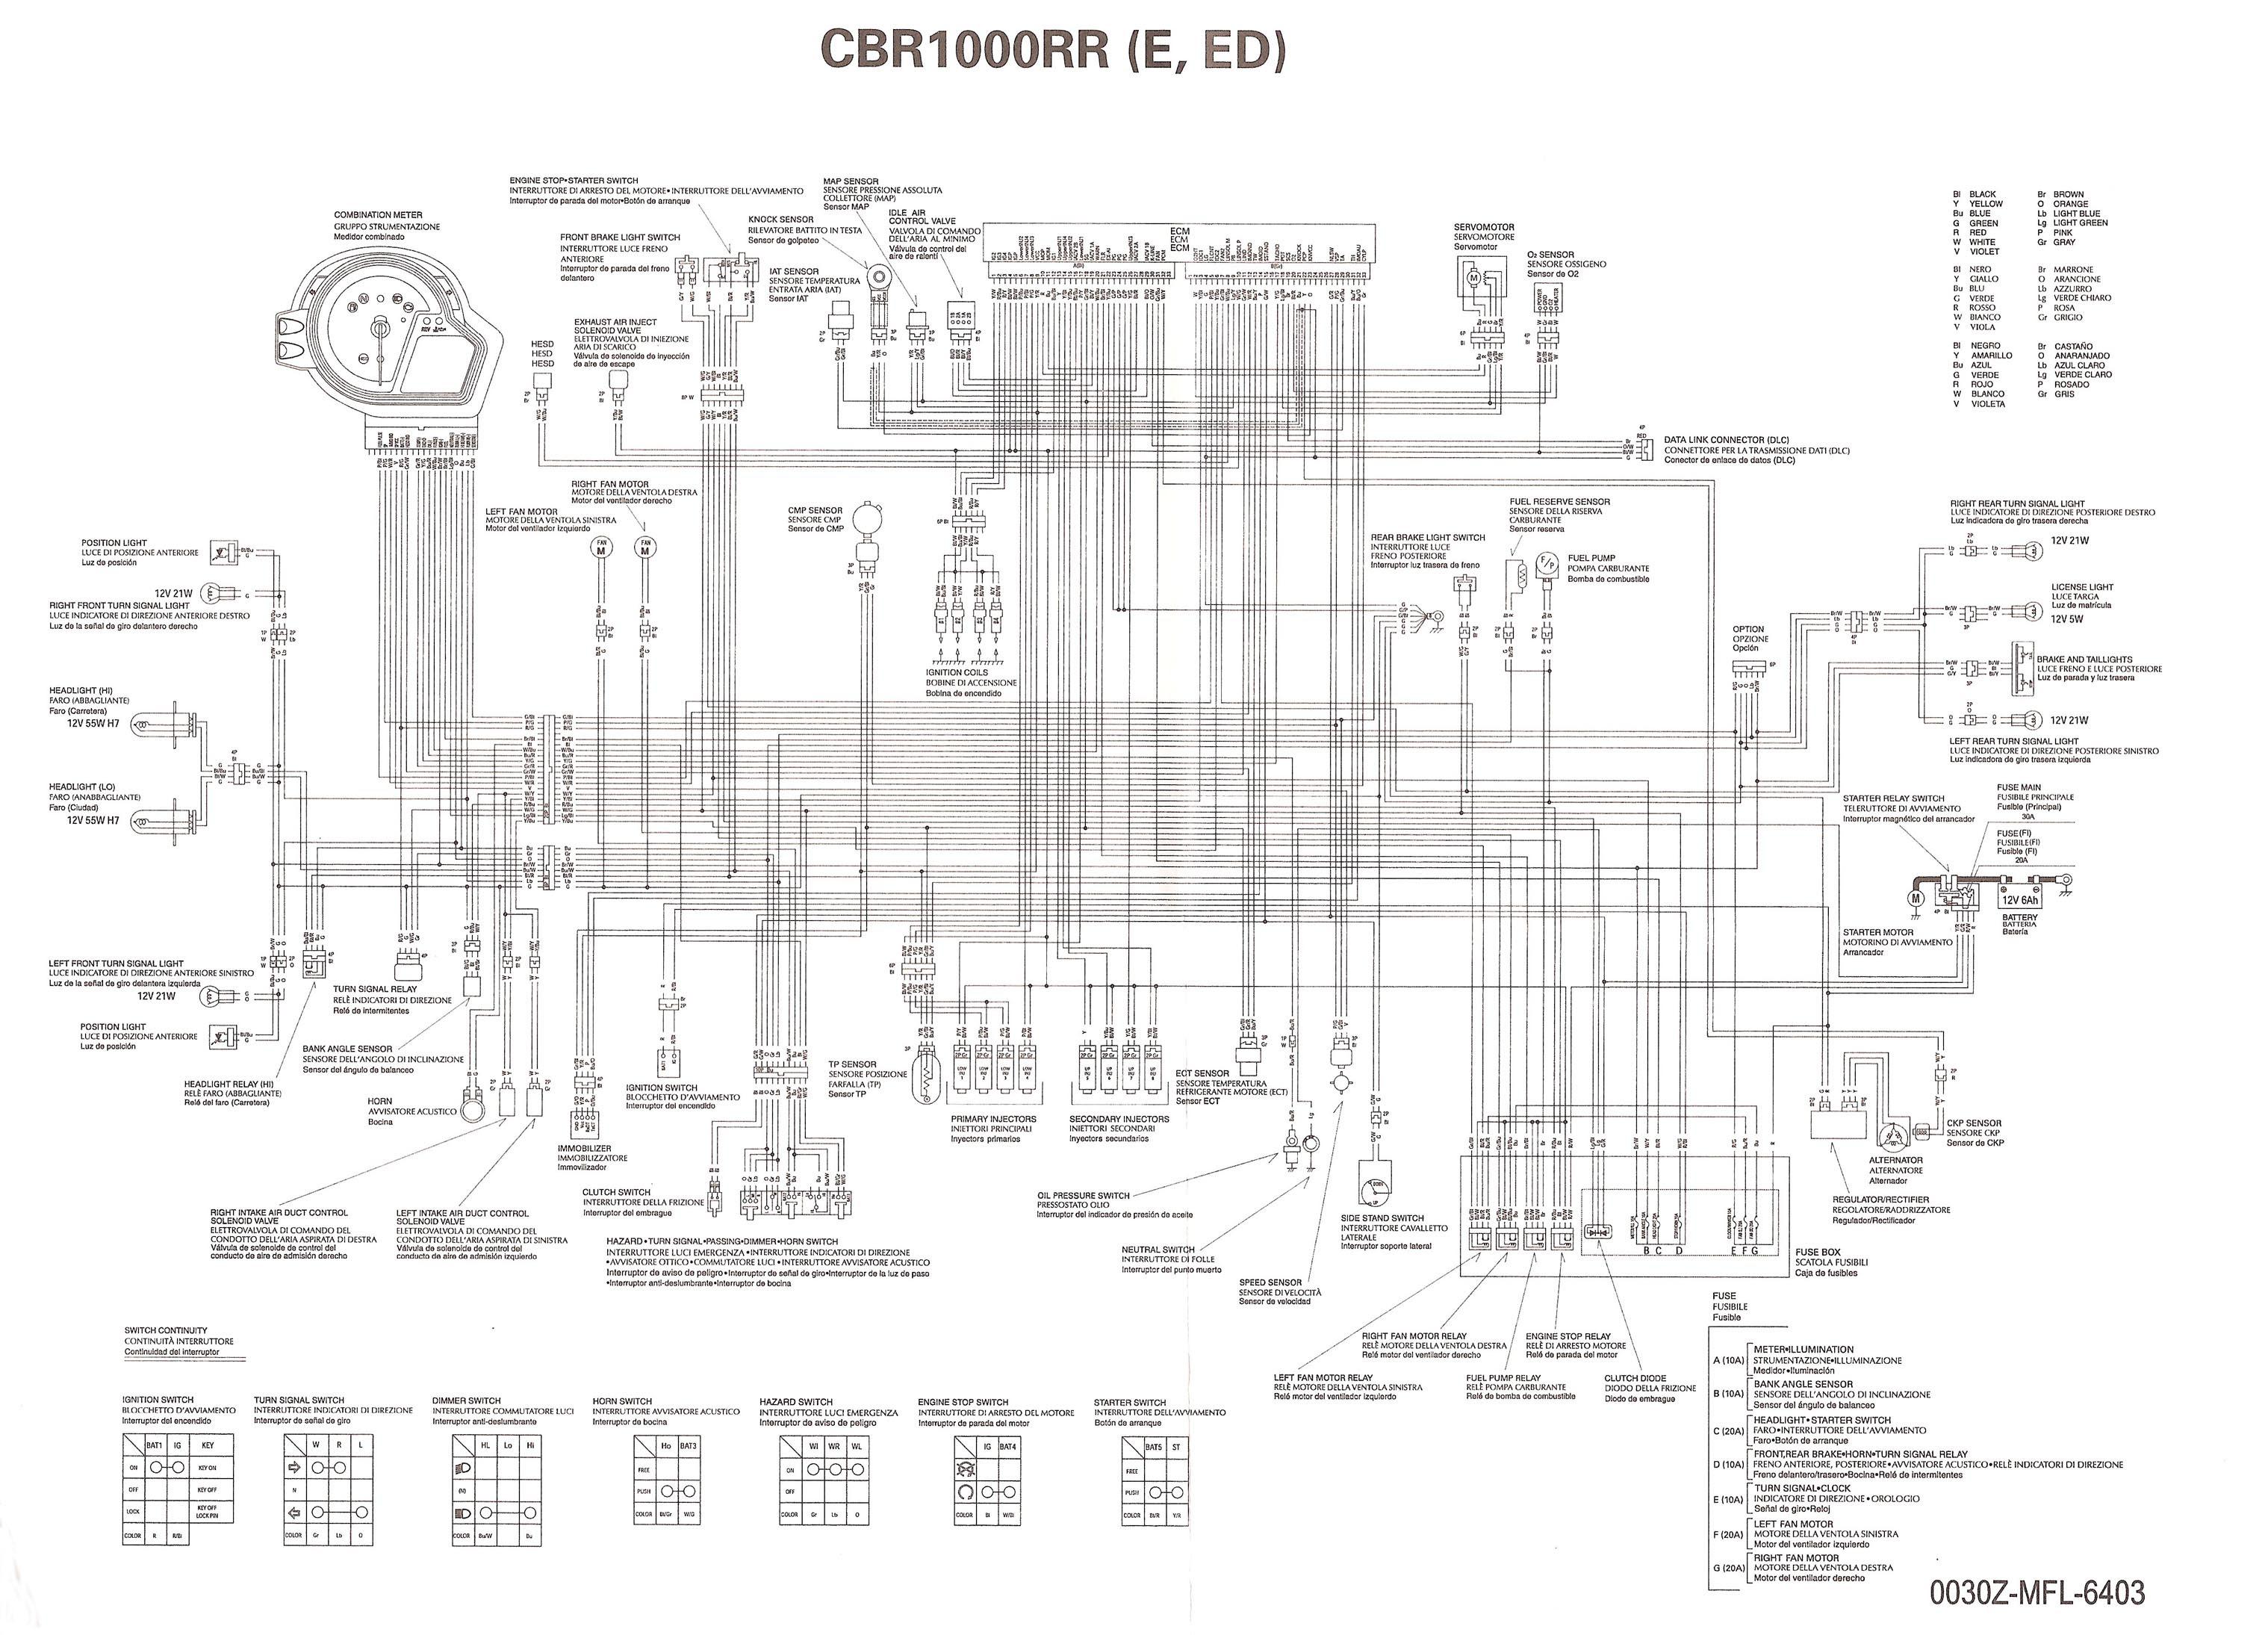 diagram] honda shadow vt 125 wiring diagram full version hd quality wiring  diagram - dngwiring.kntl.fr  dngwiring.kntl.fr